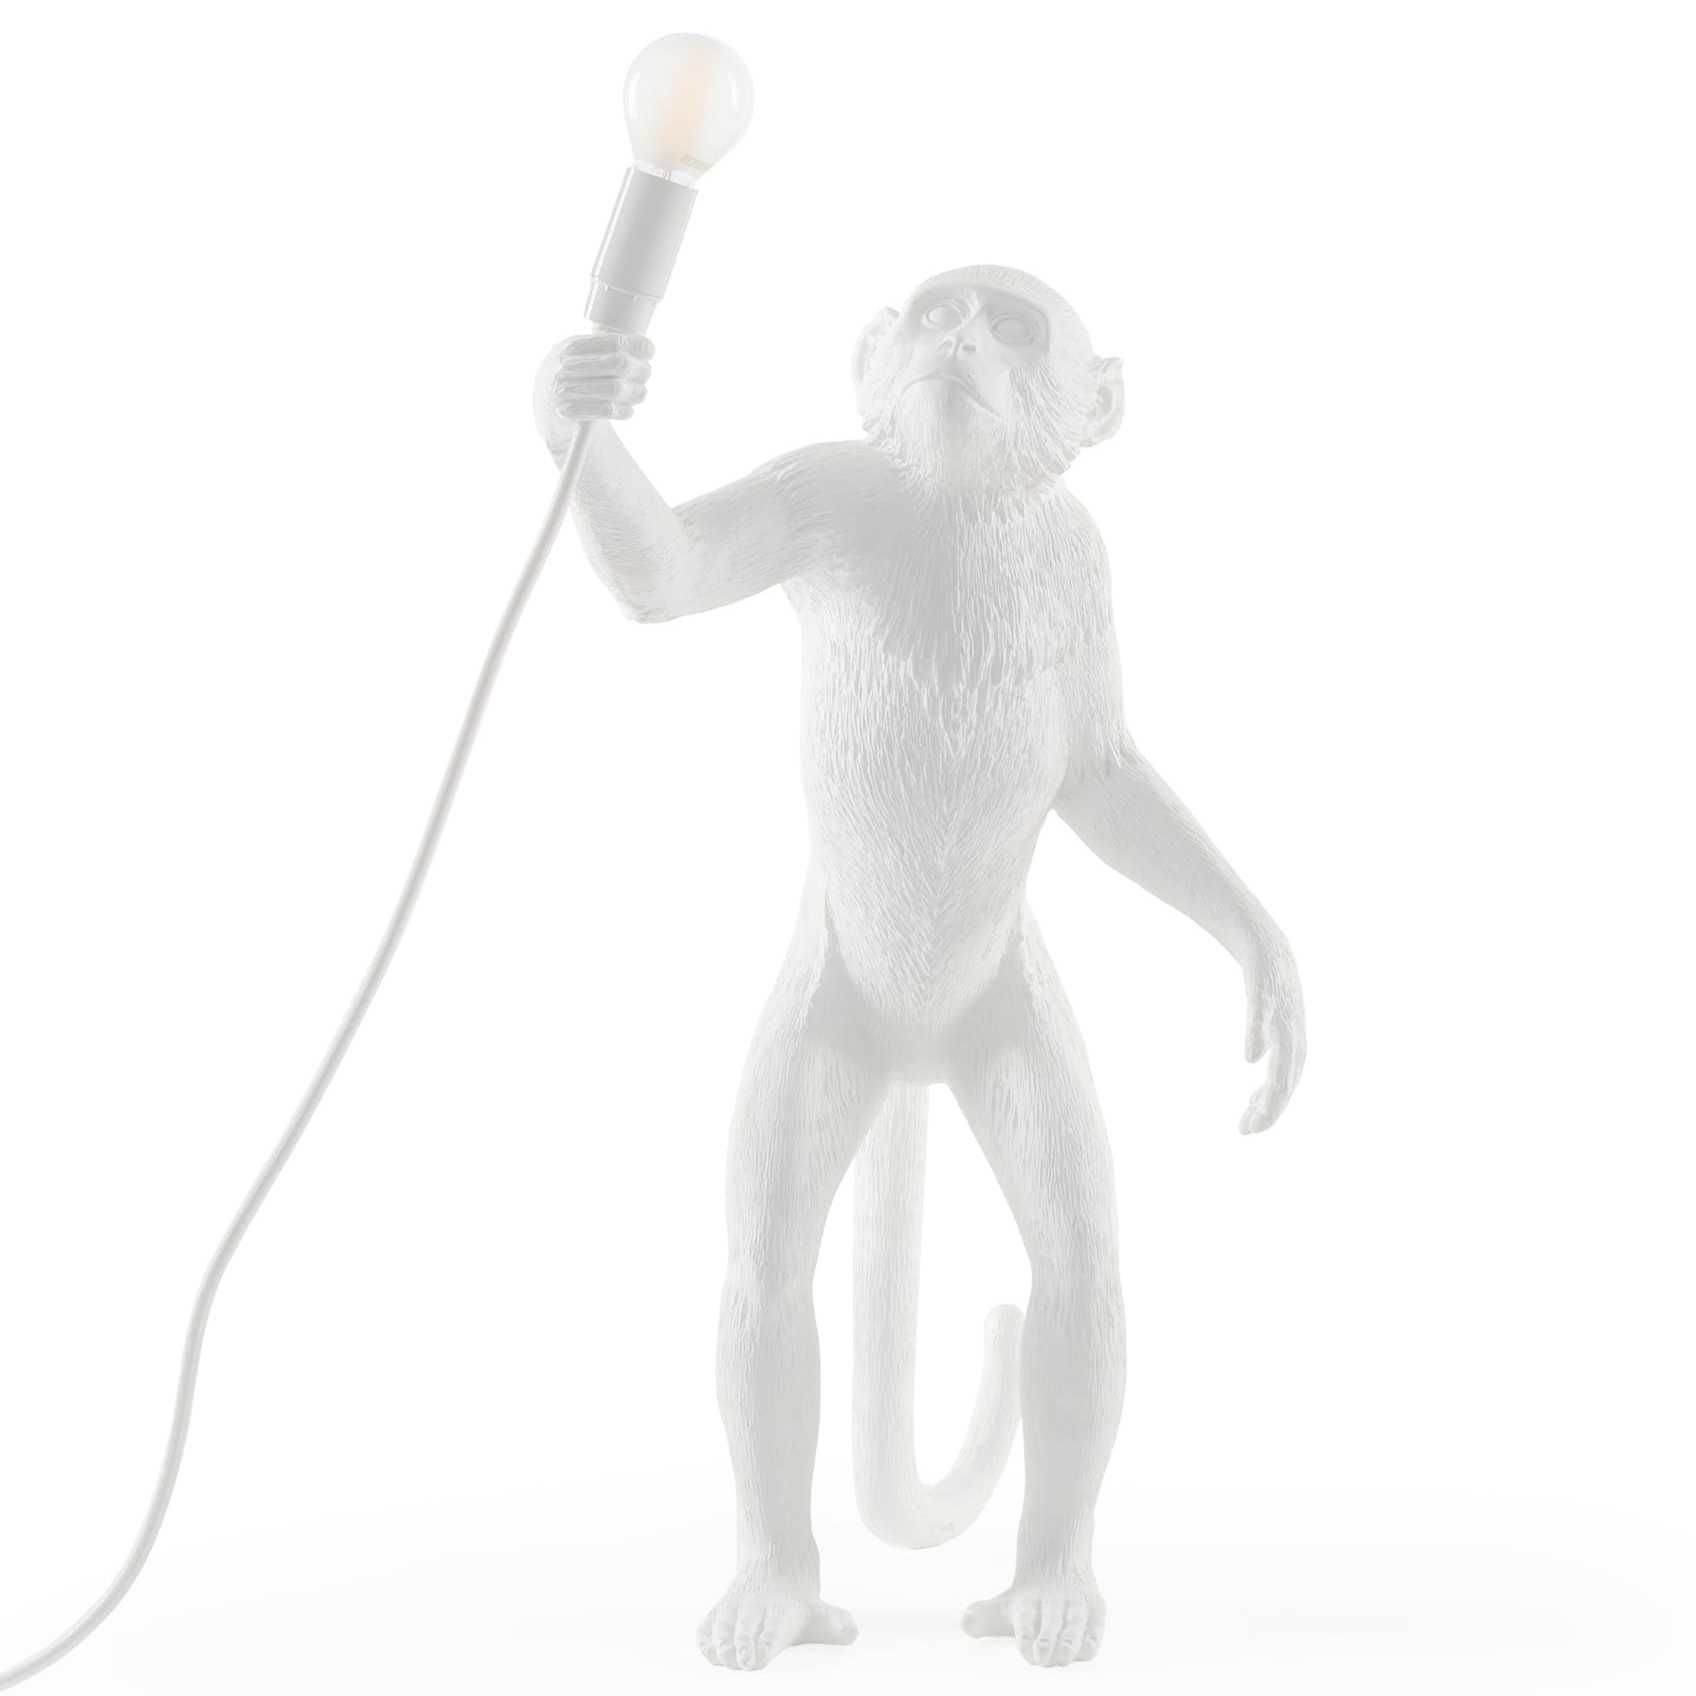 Seletti Monkey Standing vloerlamp wit